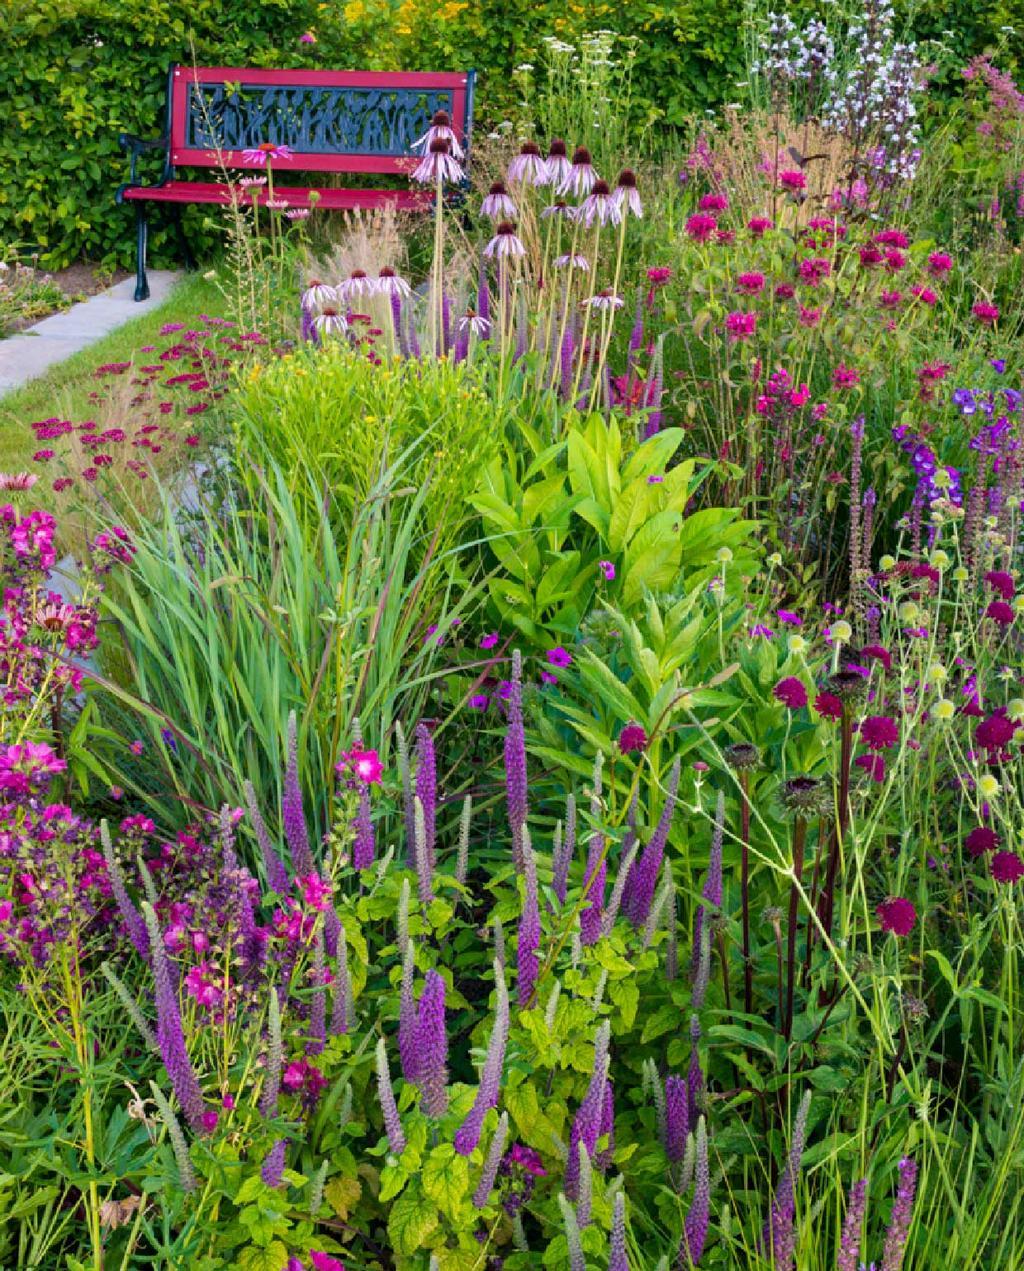 vtwonen blog kristel | prairiebeplanting rood en paarse bloemen